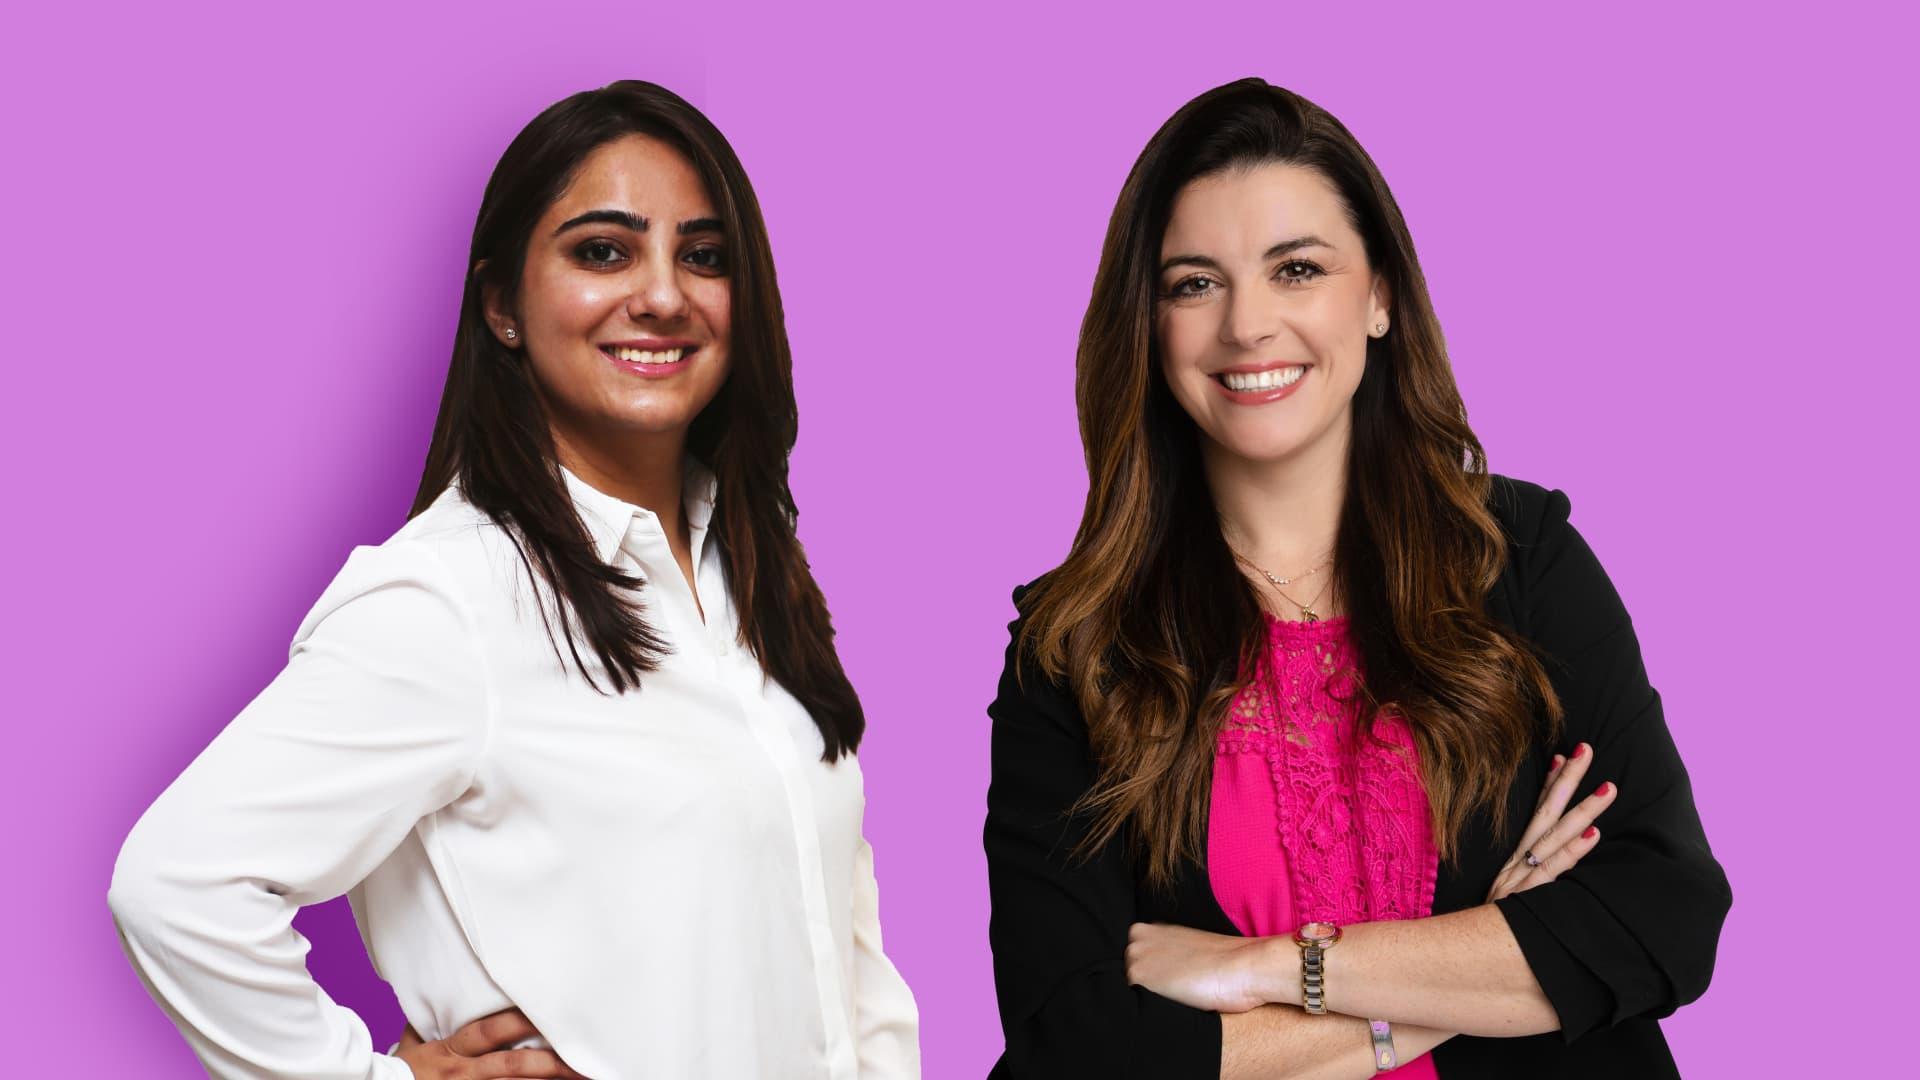 Spekit co-founders Zari Zahra and Melanie Fellay